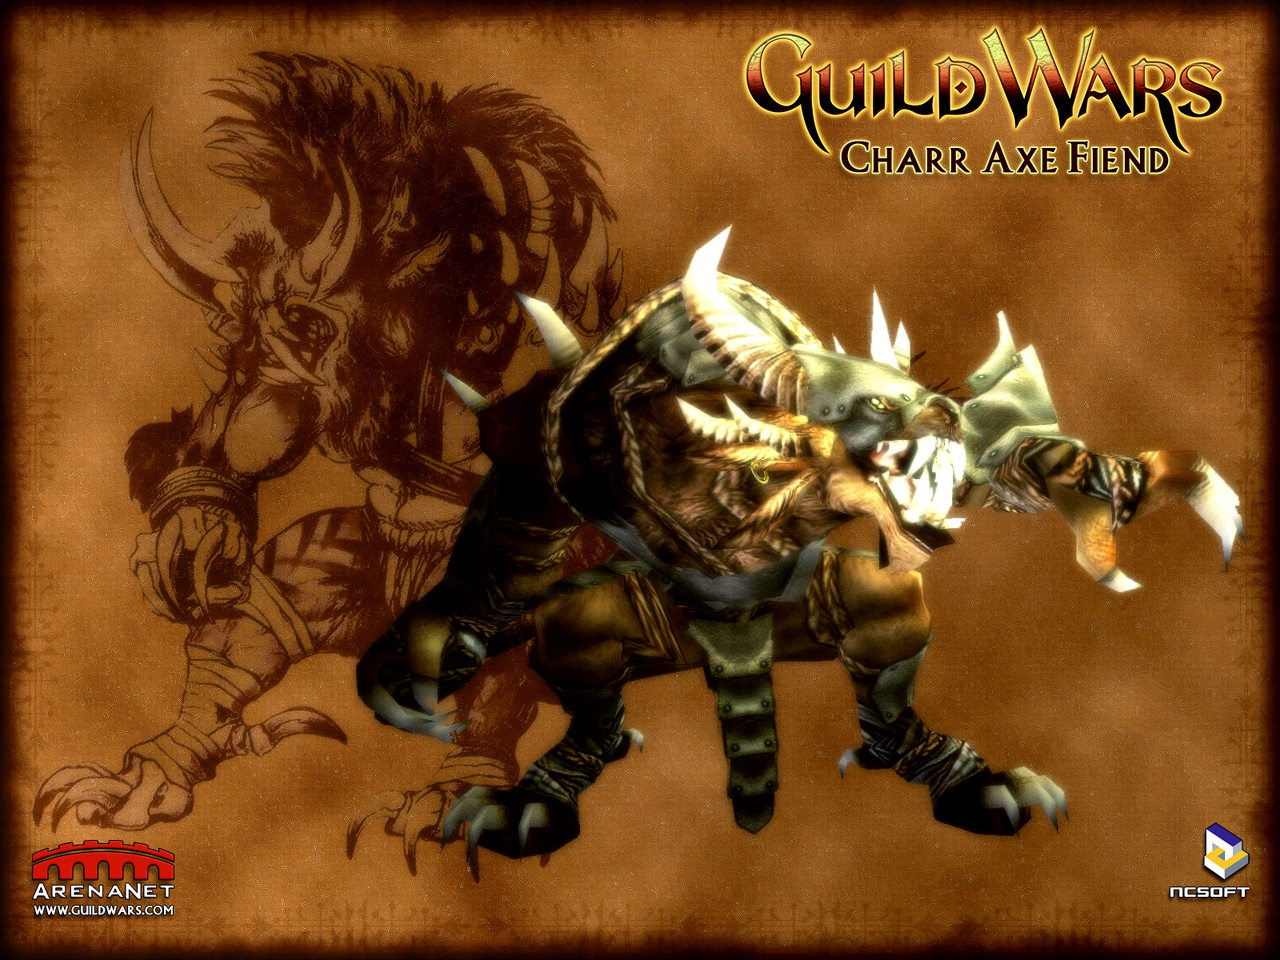 guildwars wallpaper monsters-charraxefiend-1280